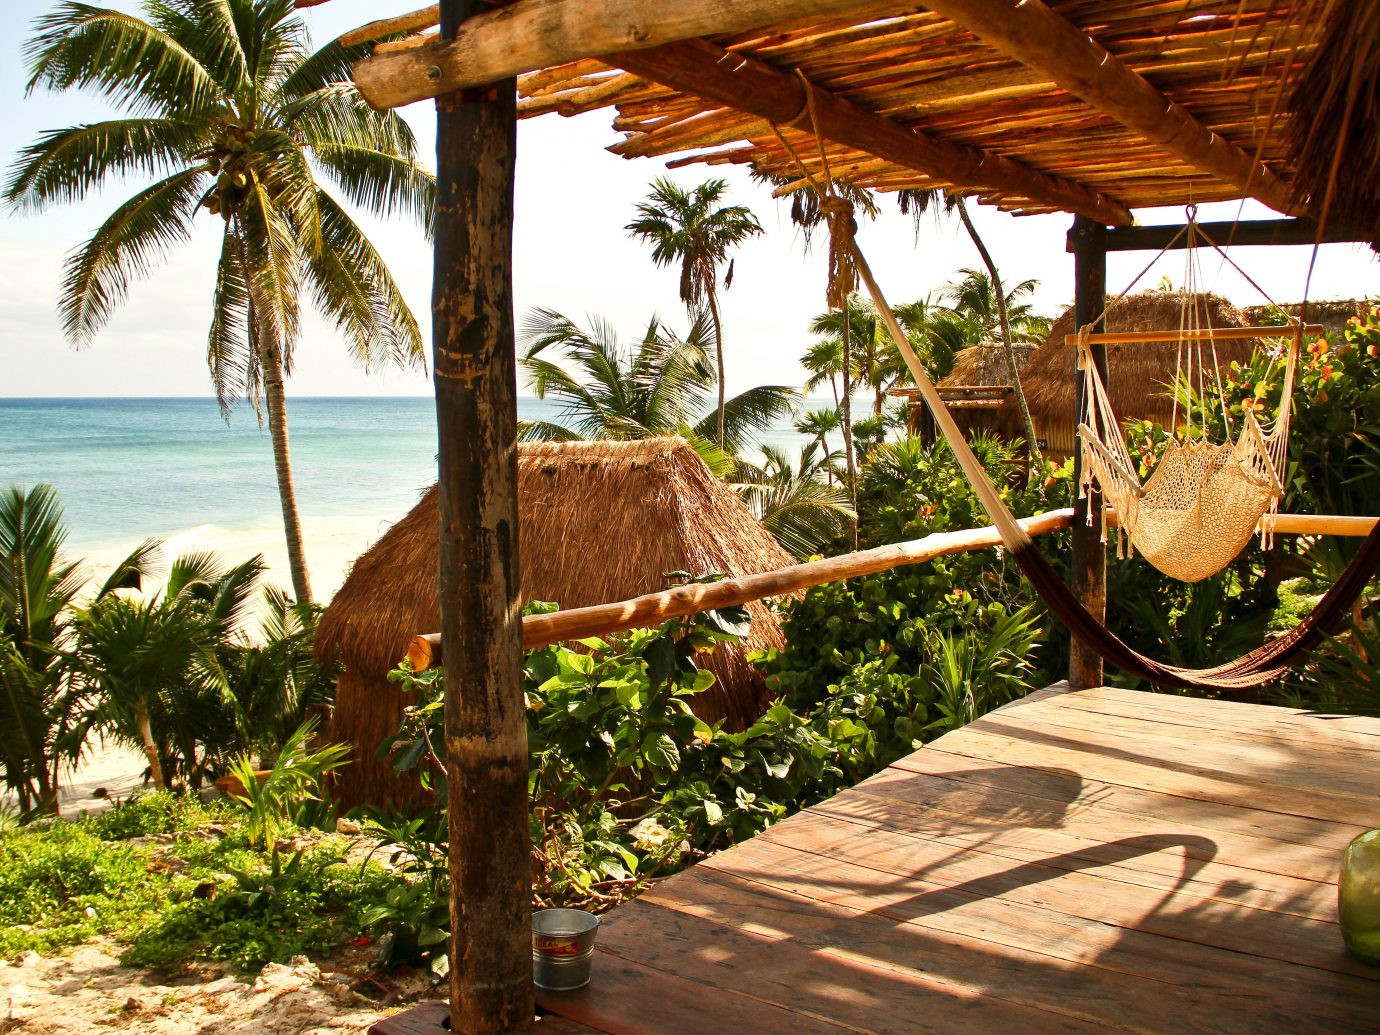 Beachfront Deck Eco Hotels Island Villa tree outdoor sky Resort vacation palm arecales tropics estate Jungle palm family plant shade